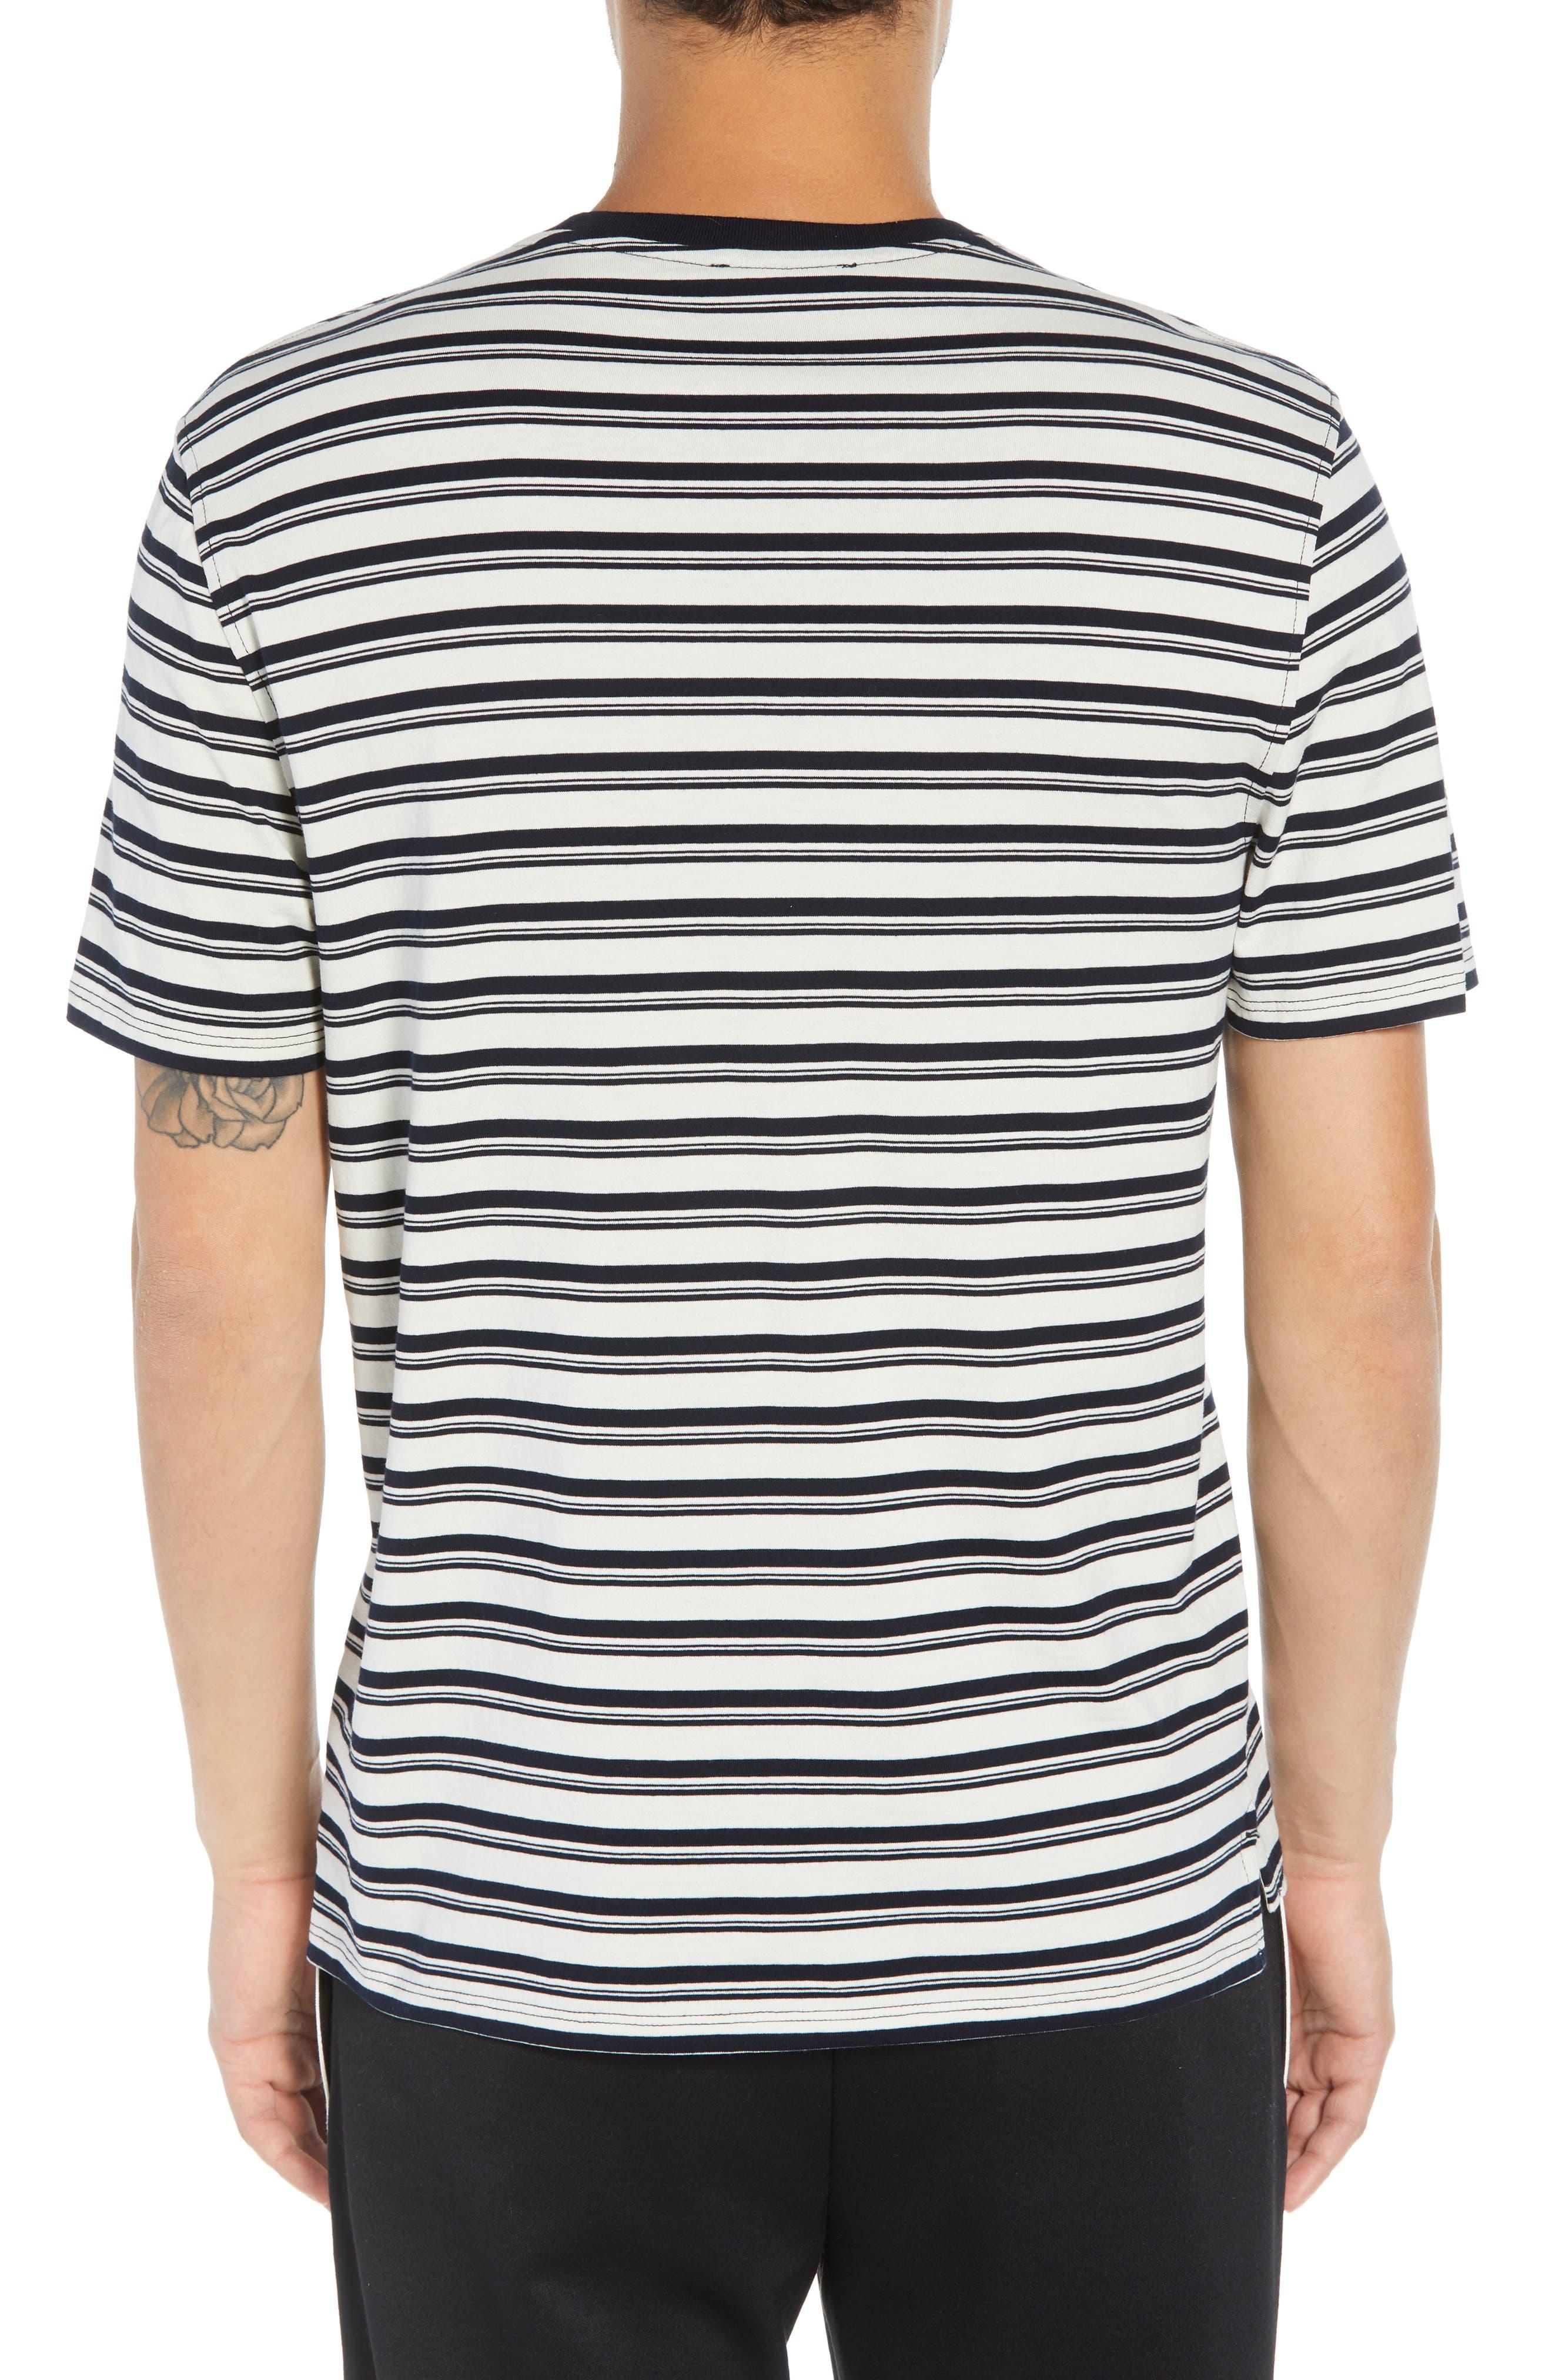 Variegated Stripe Regular Fit Cotton Crewneck T-Shirt,                             Alternate thumbnail 2, color,                             400